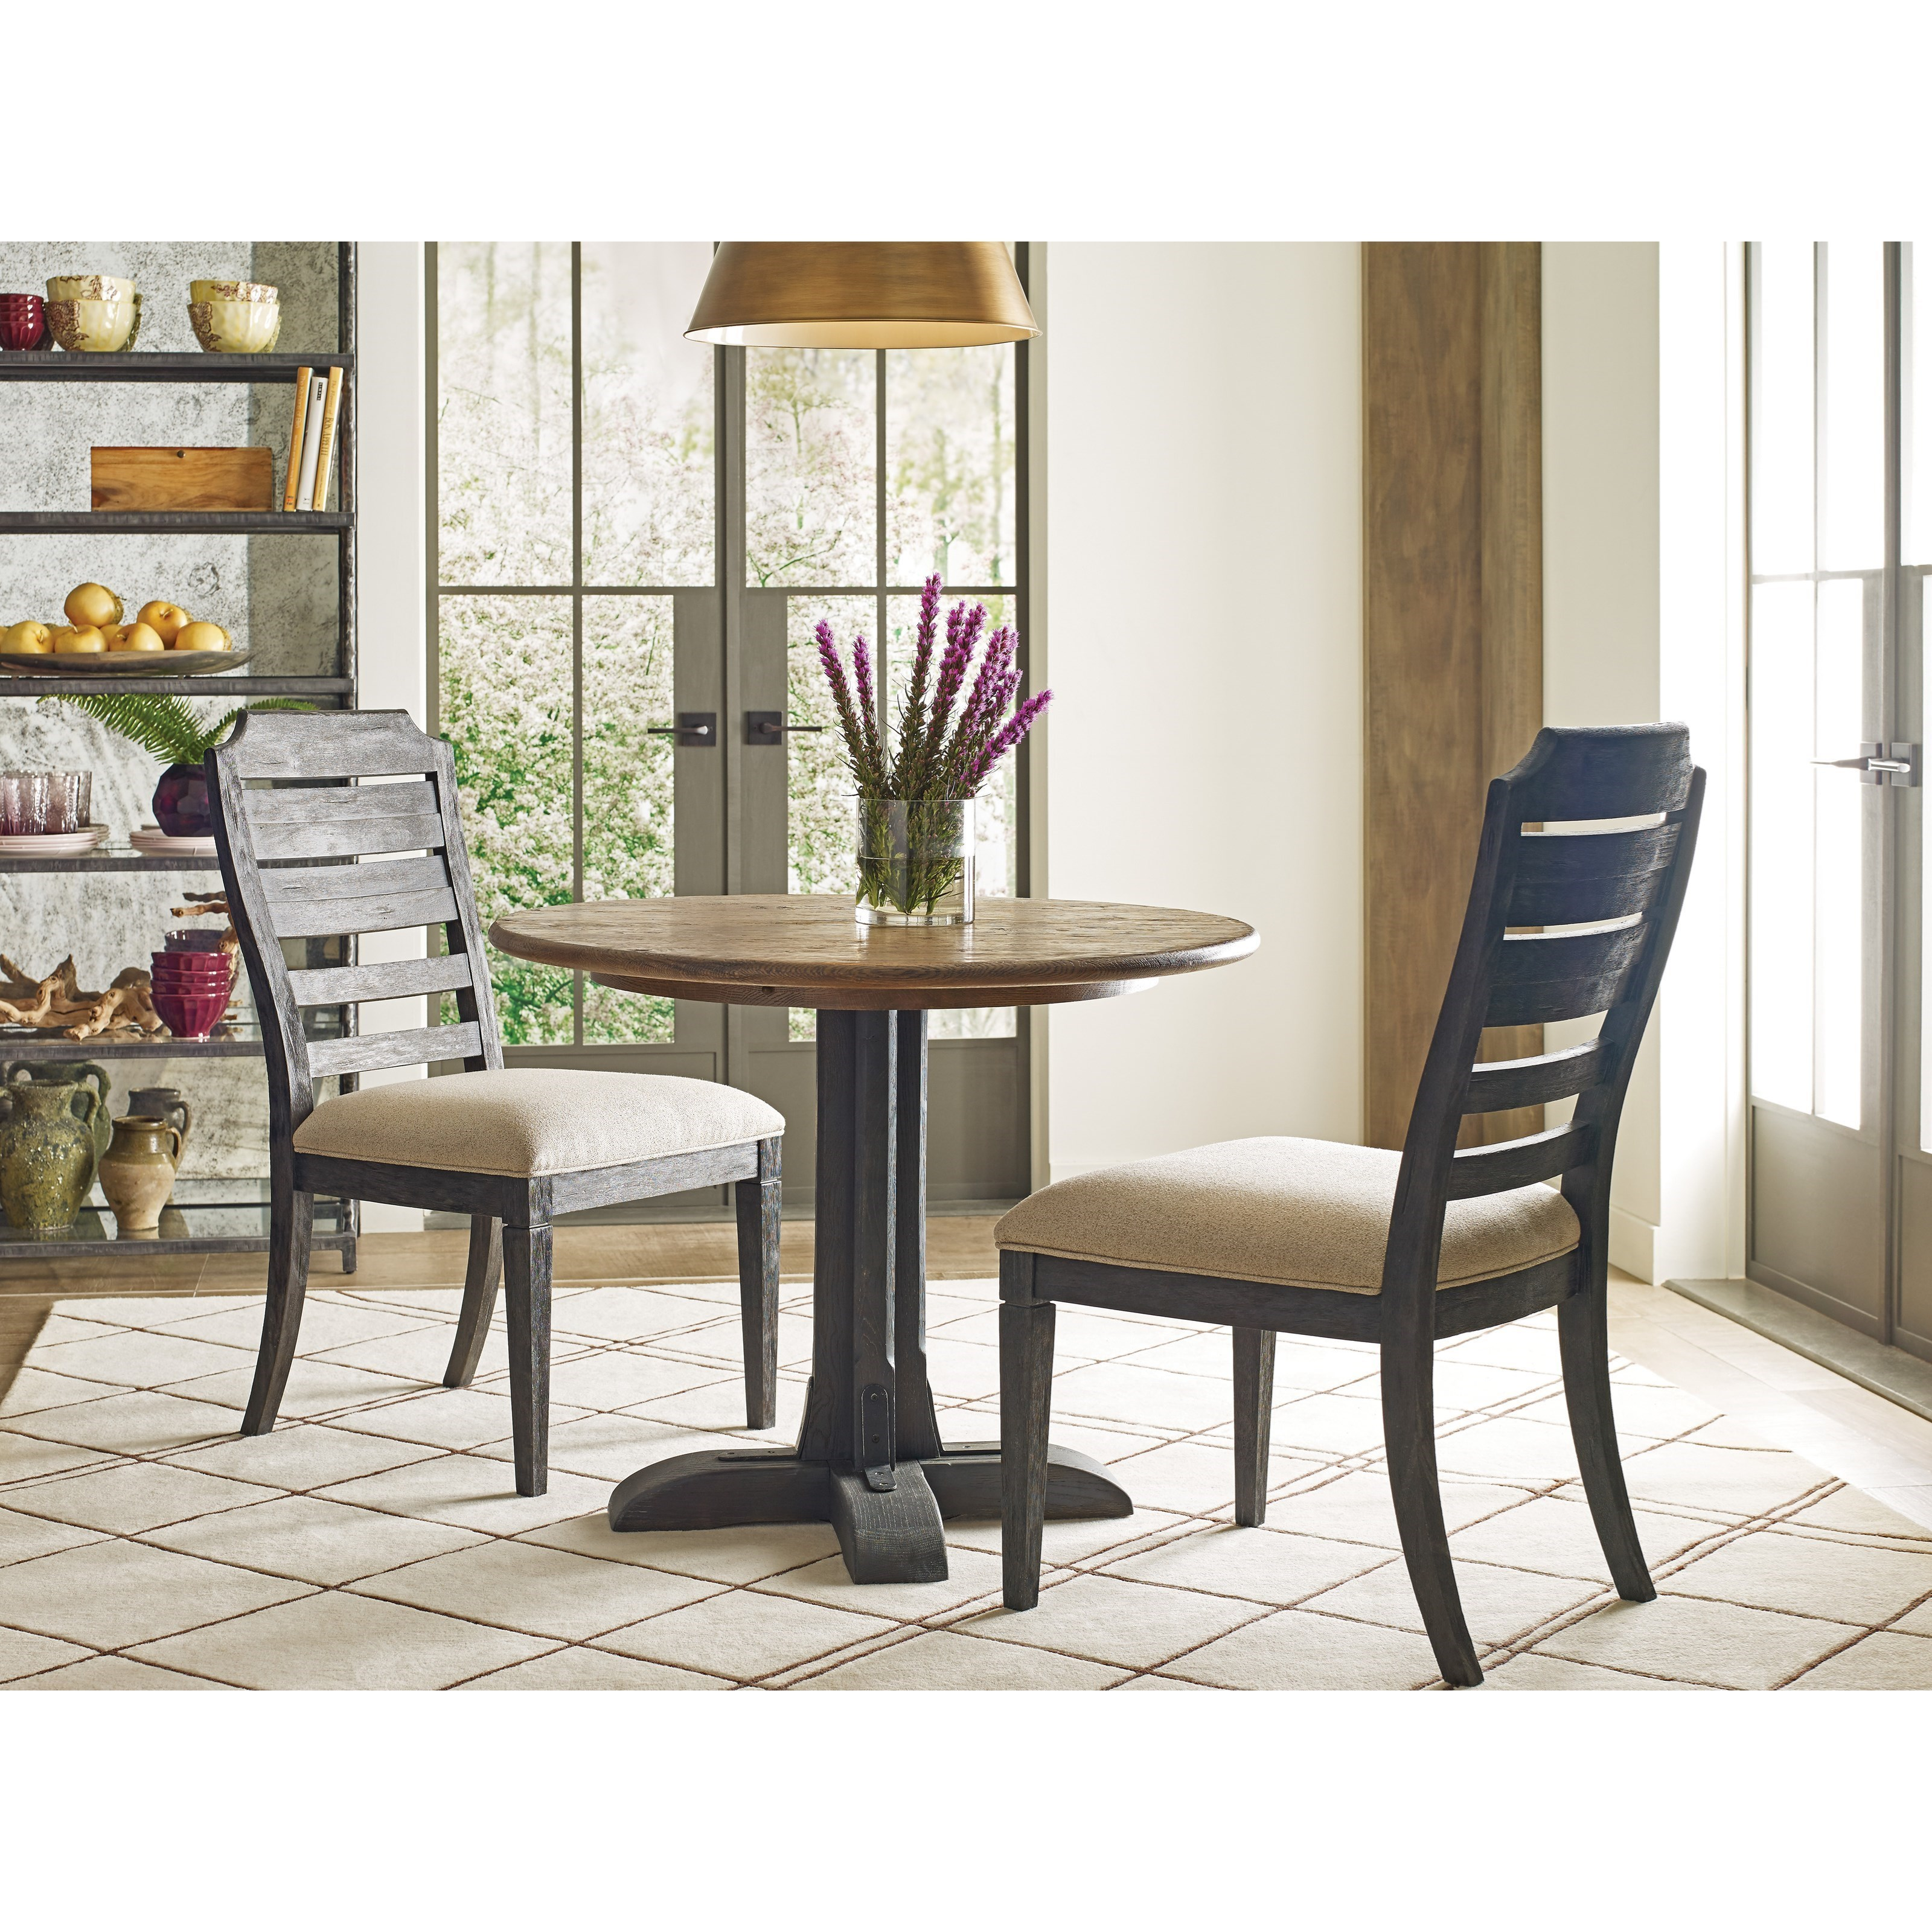 Kincaid Furniture TrailsThree Piece Dining Set